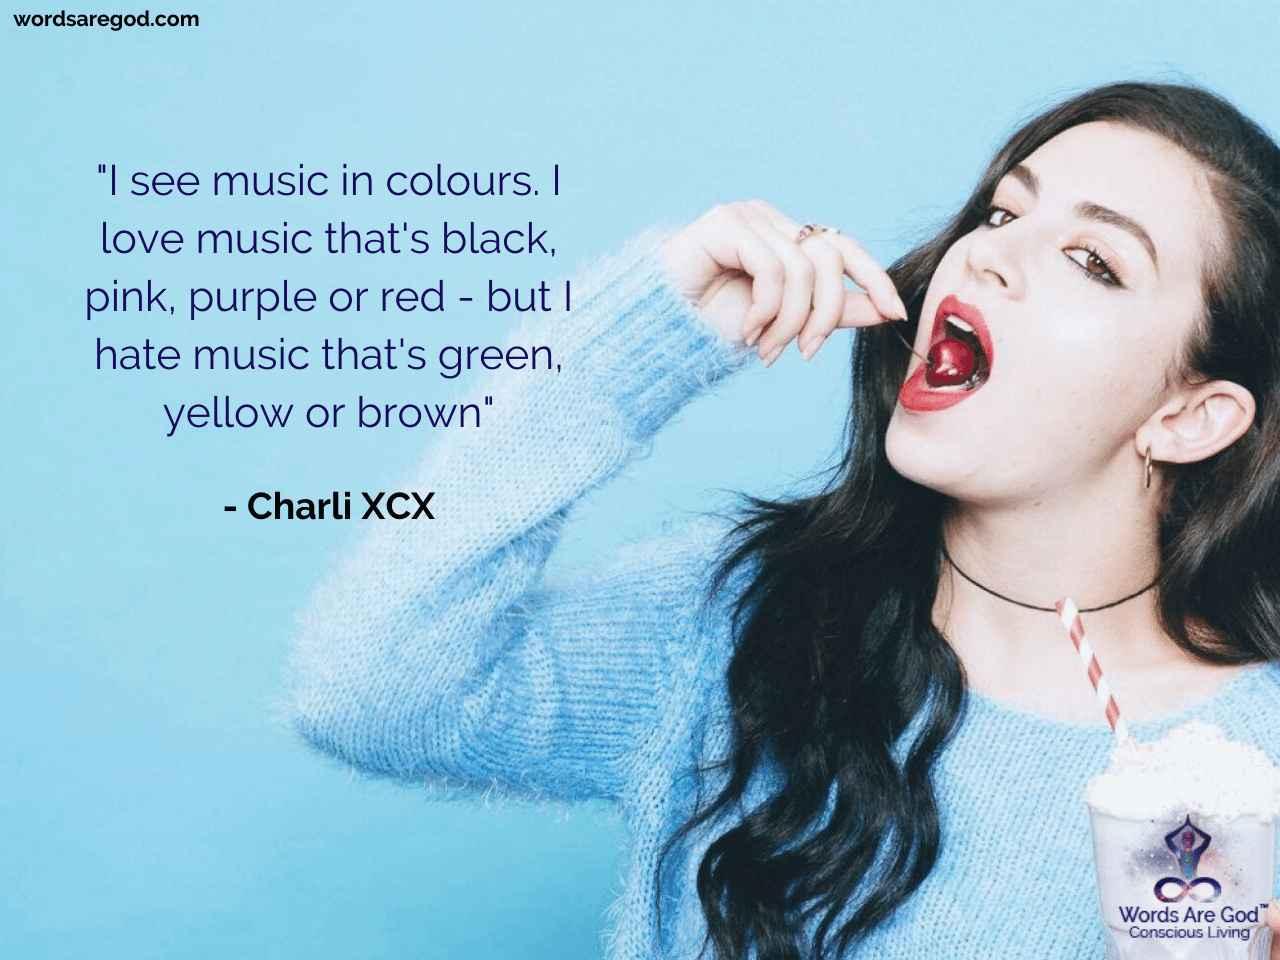 Charli XCX Motivational Quote by Charli XCX